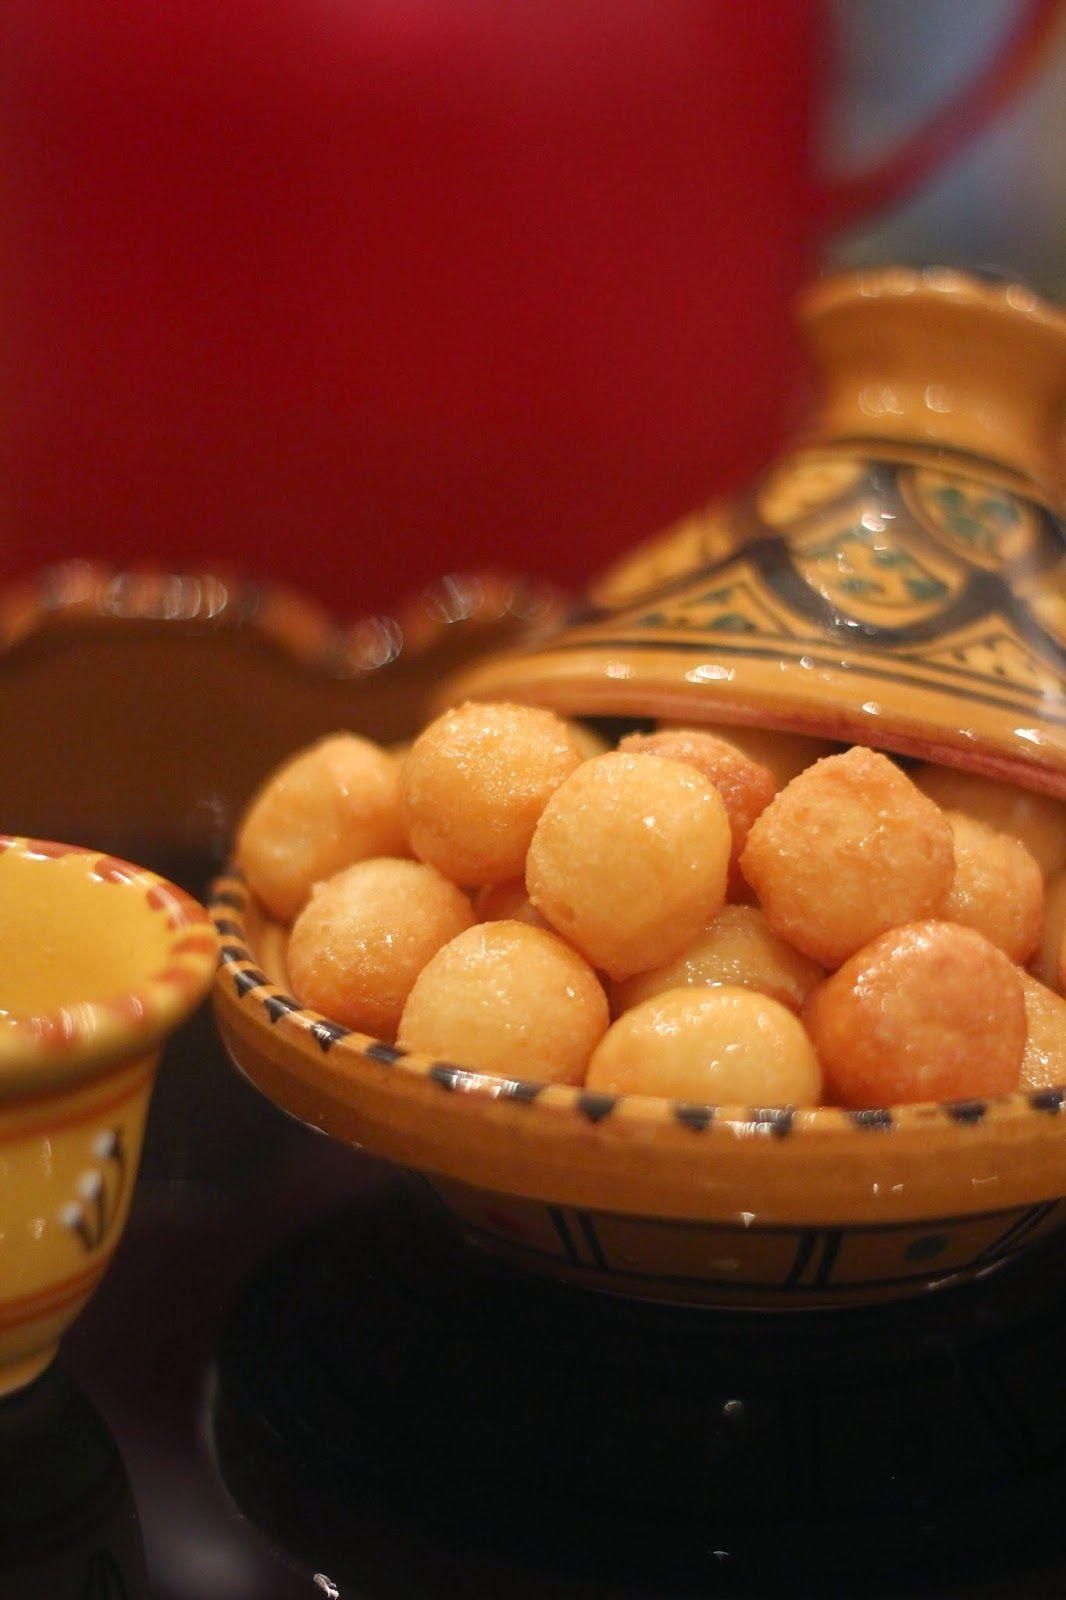 Memokitchen ميني لقيمات لذيييذه Food Arabic Sweets Cooking